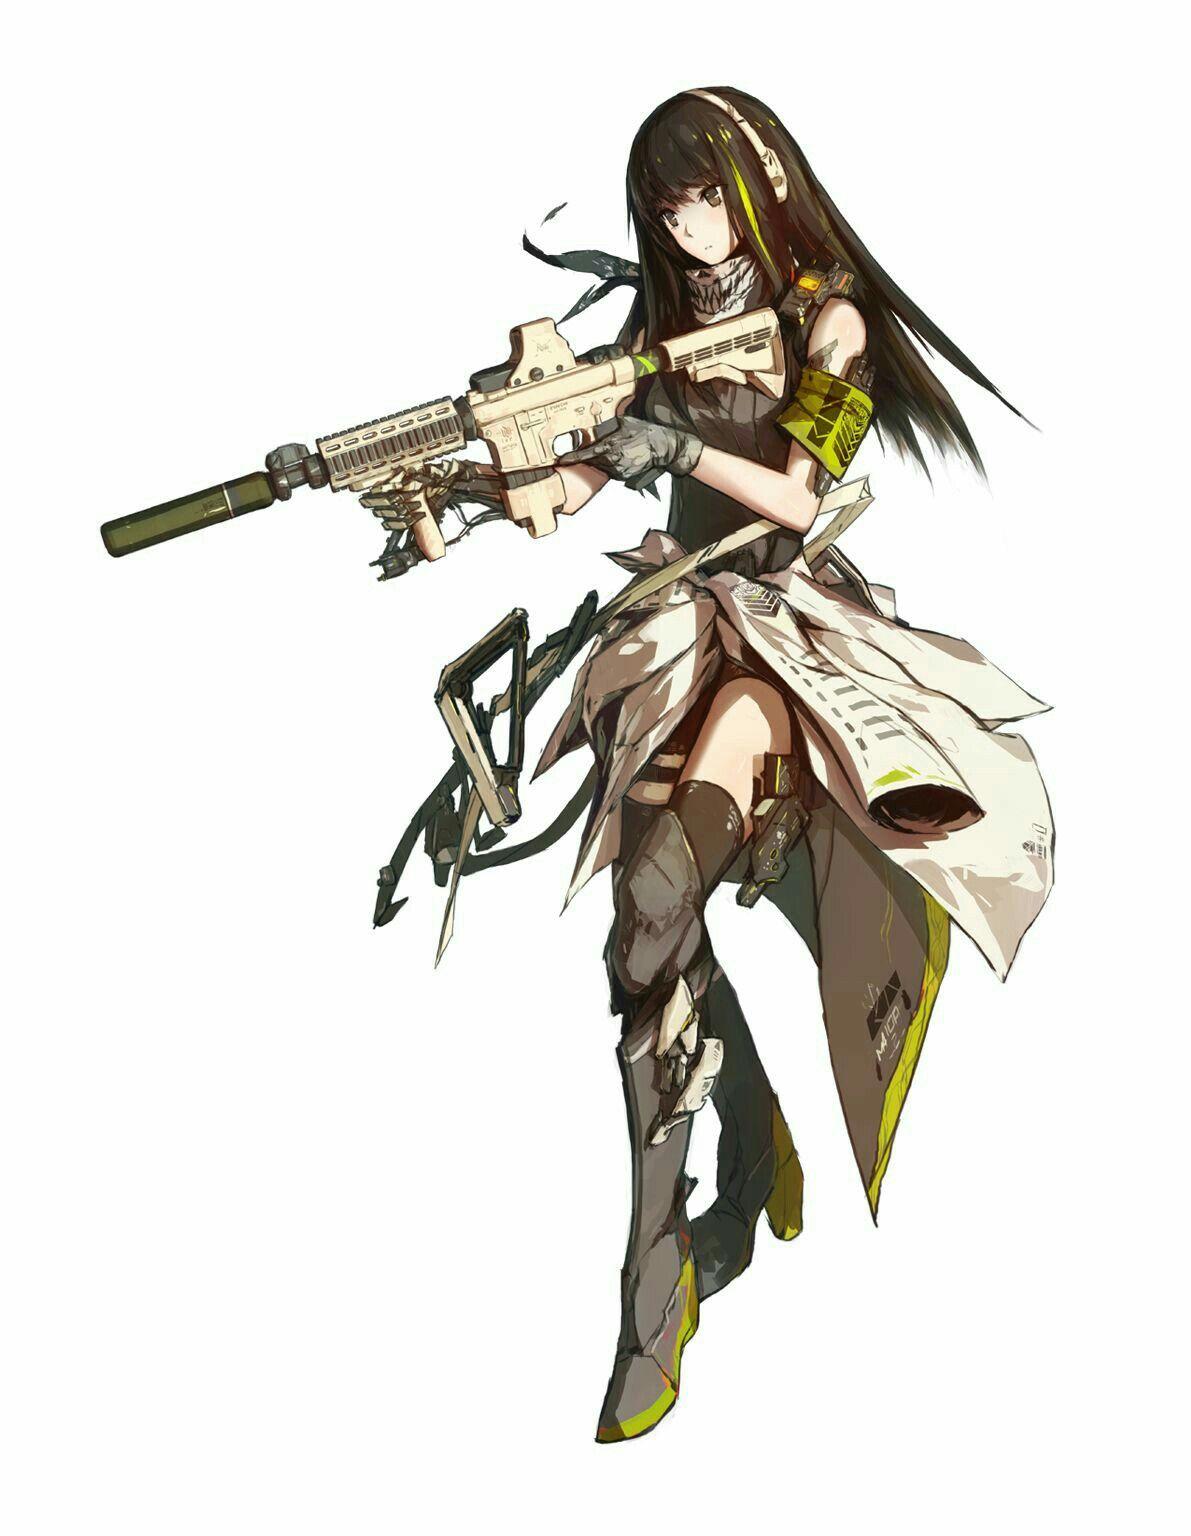 Girl anime animegirl weapon knife gun wallpapers - Anime girl with weapon ...